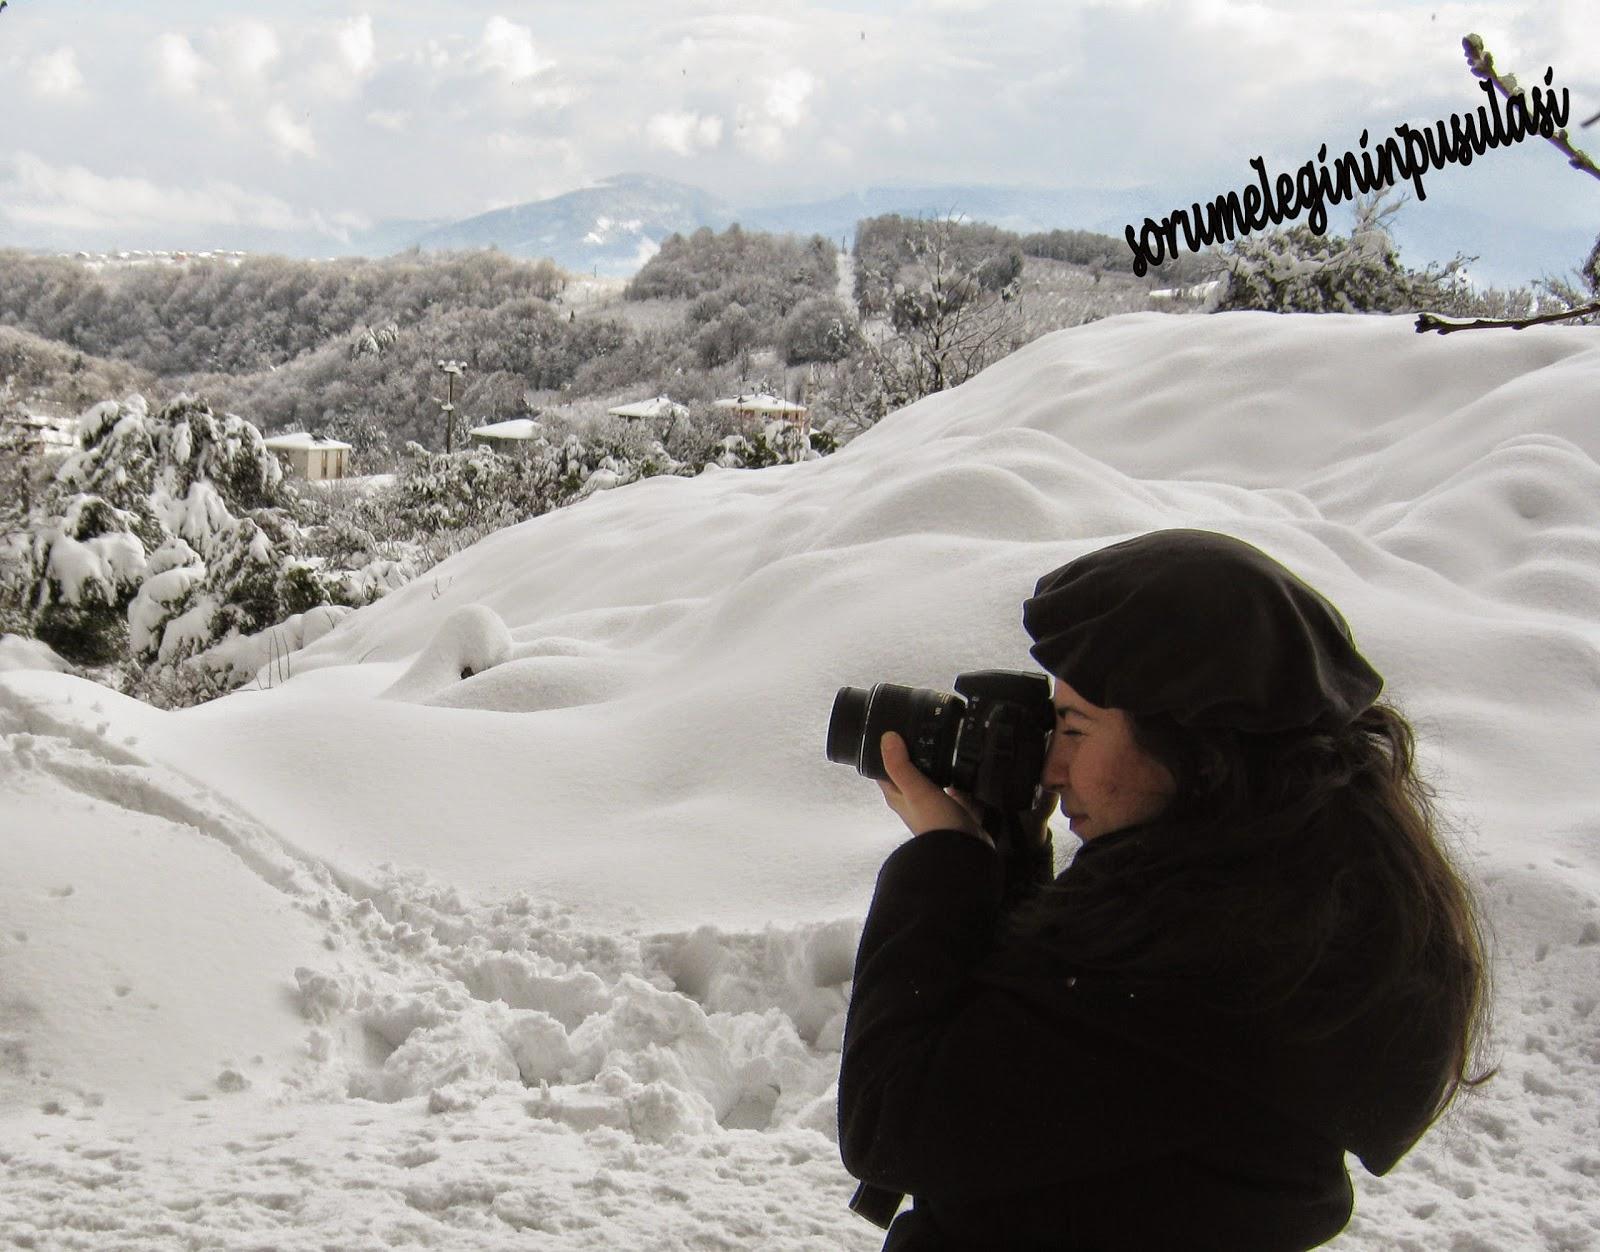 kar-snow-fotoğraf-fotoğrafçılık-fotograf-fotografcilik-photo-pic-photography